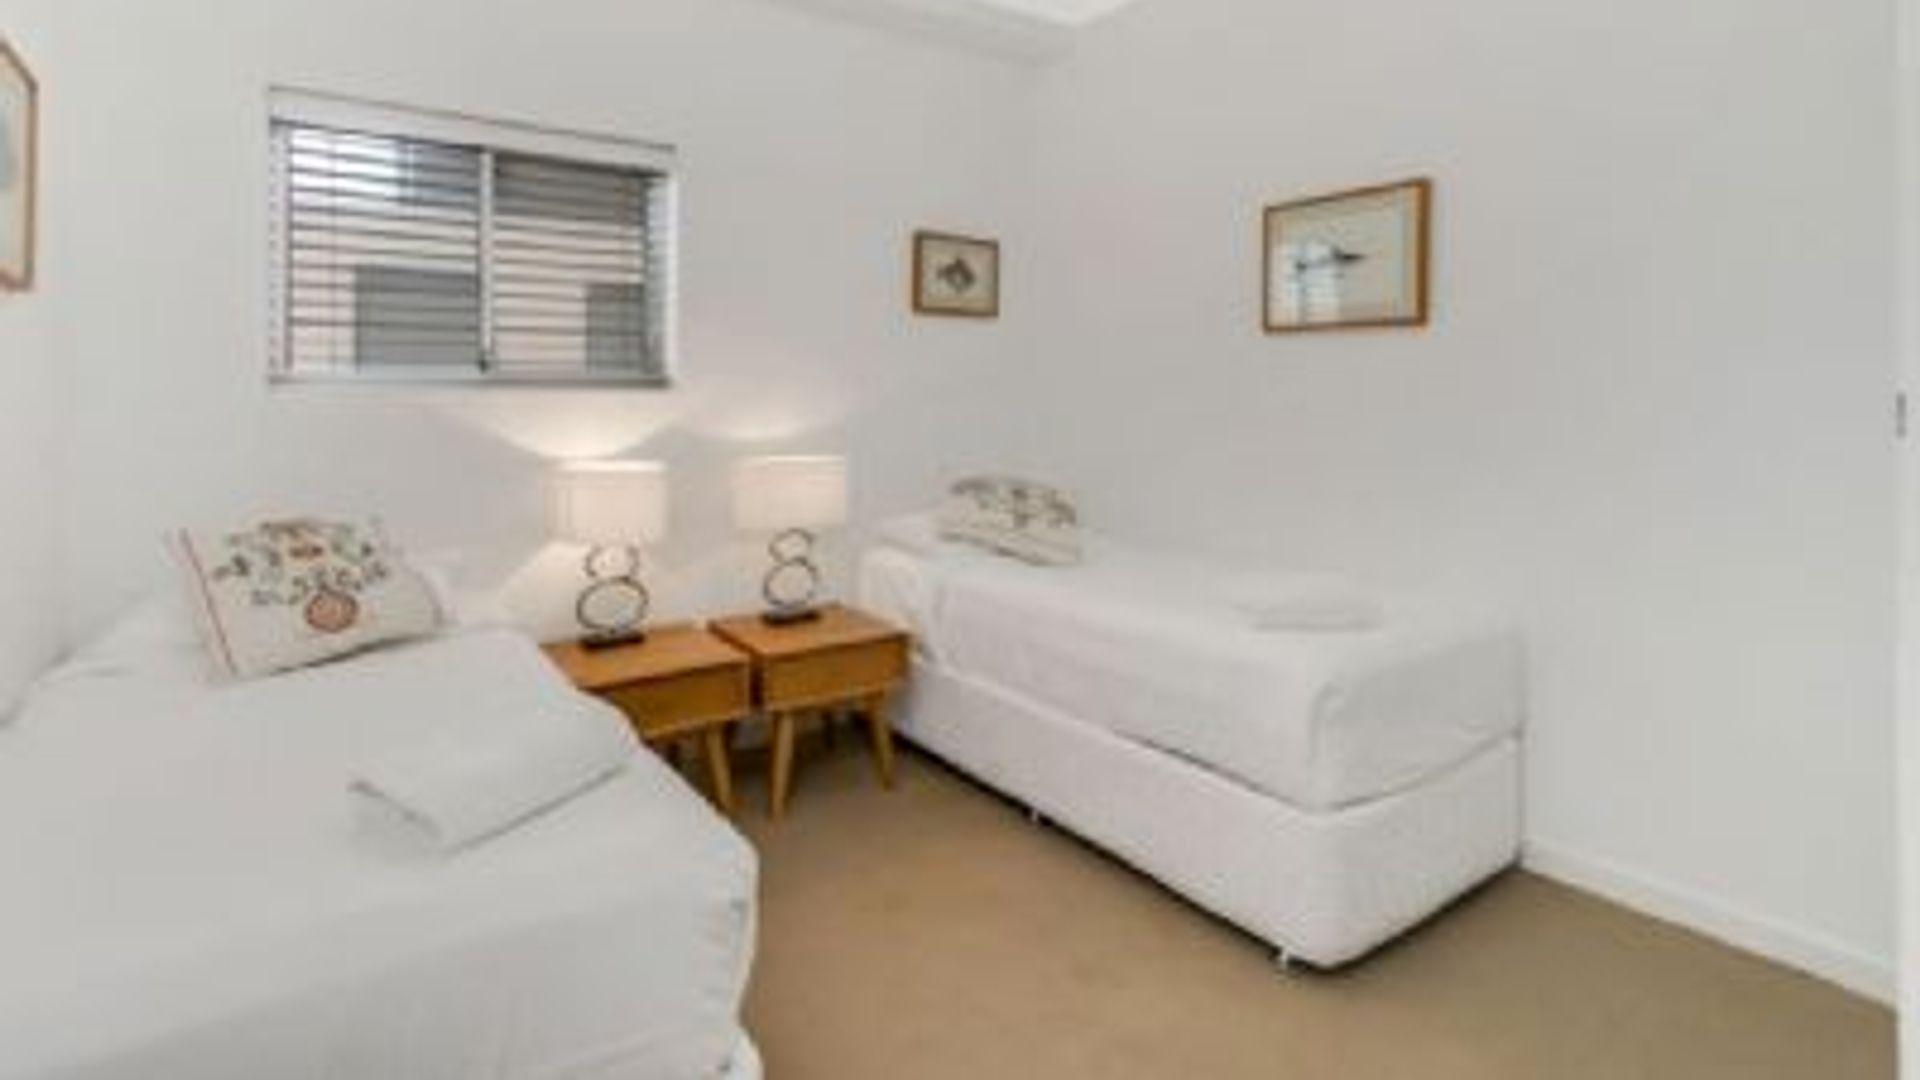 2 Bedroom Apartment At Surf View Ramsgate Avenue North Bondi 2026 Australia 4612359 Rentberry